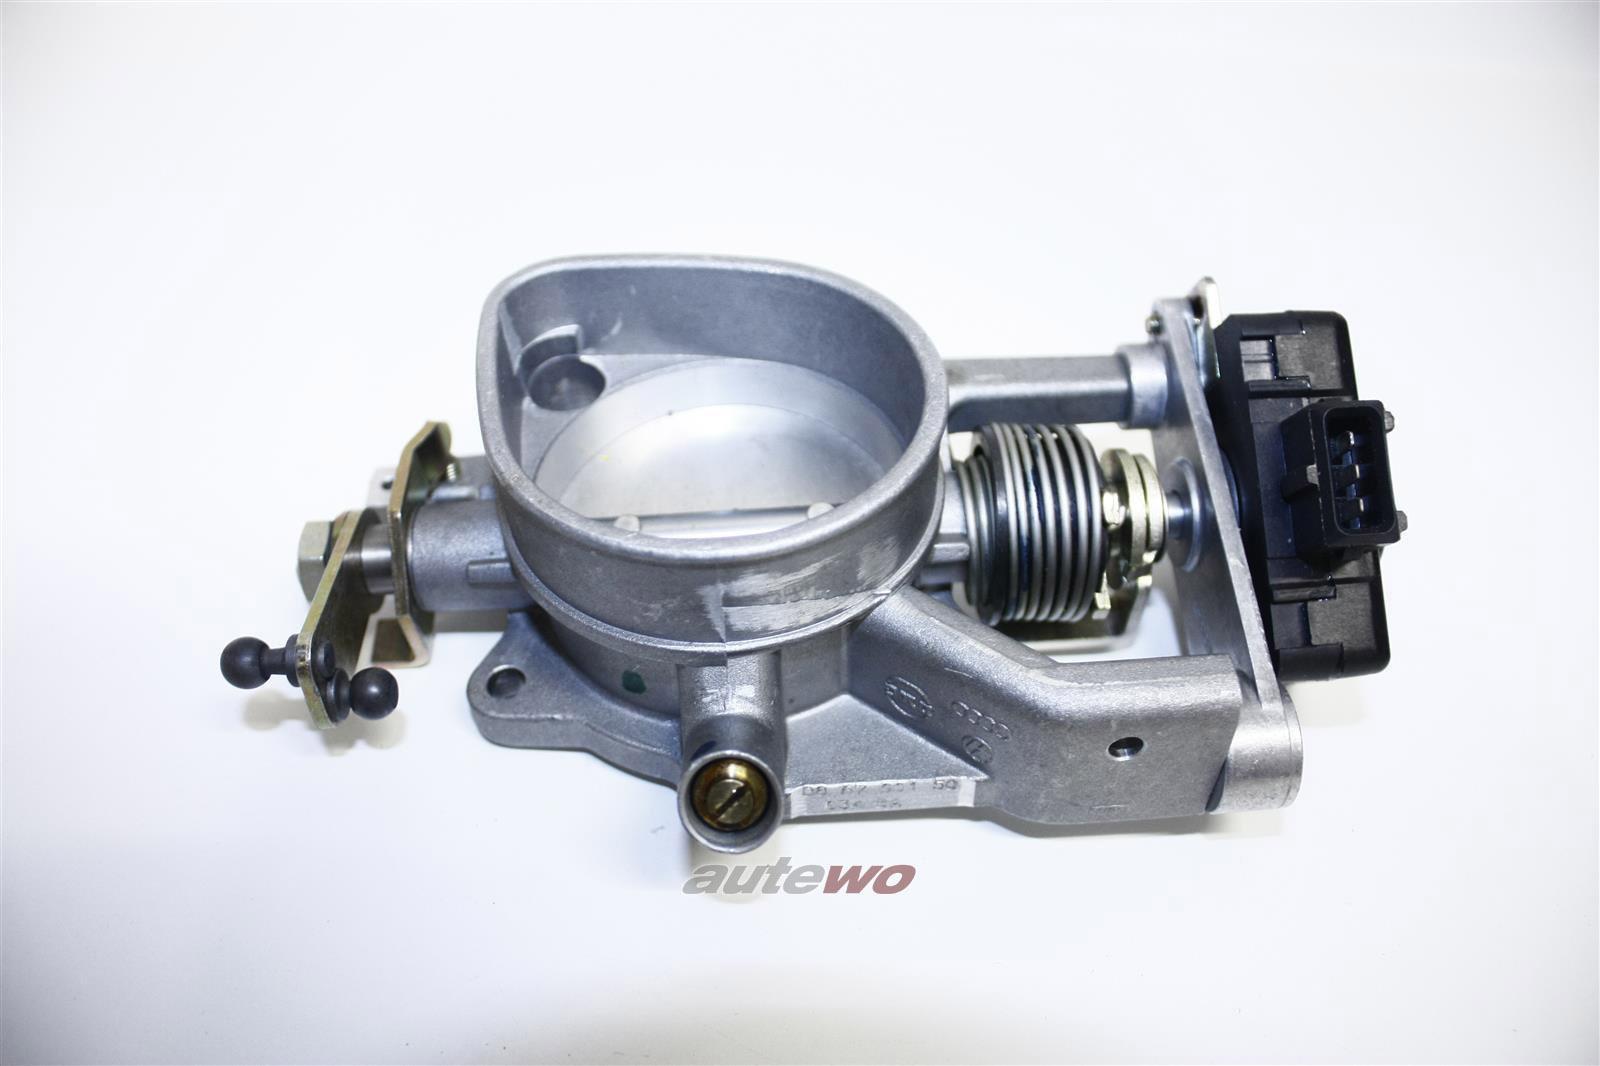 034133063BA NEU Audi 100/200 Typ 44 2.2l 5 Zyl. 10V Turbo 2B/MC Drosselklappe